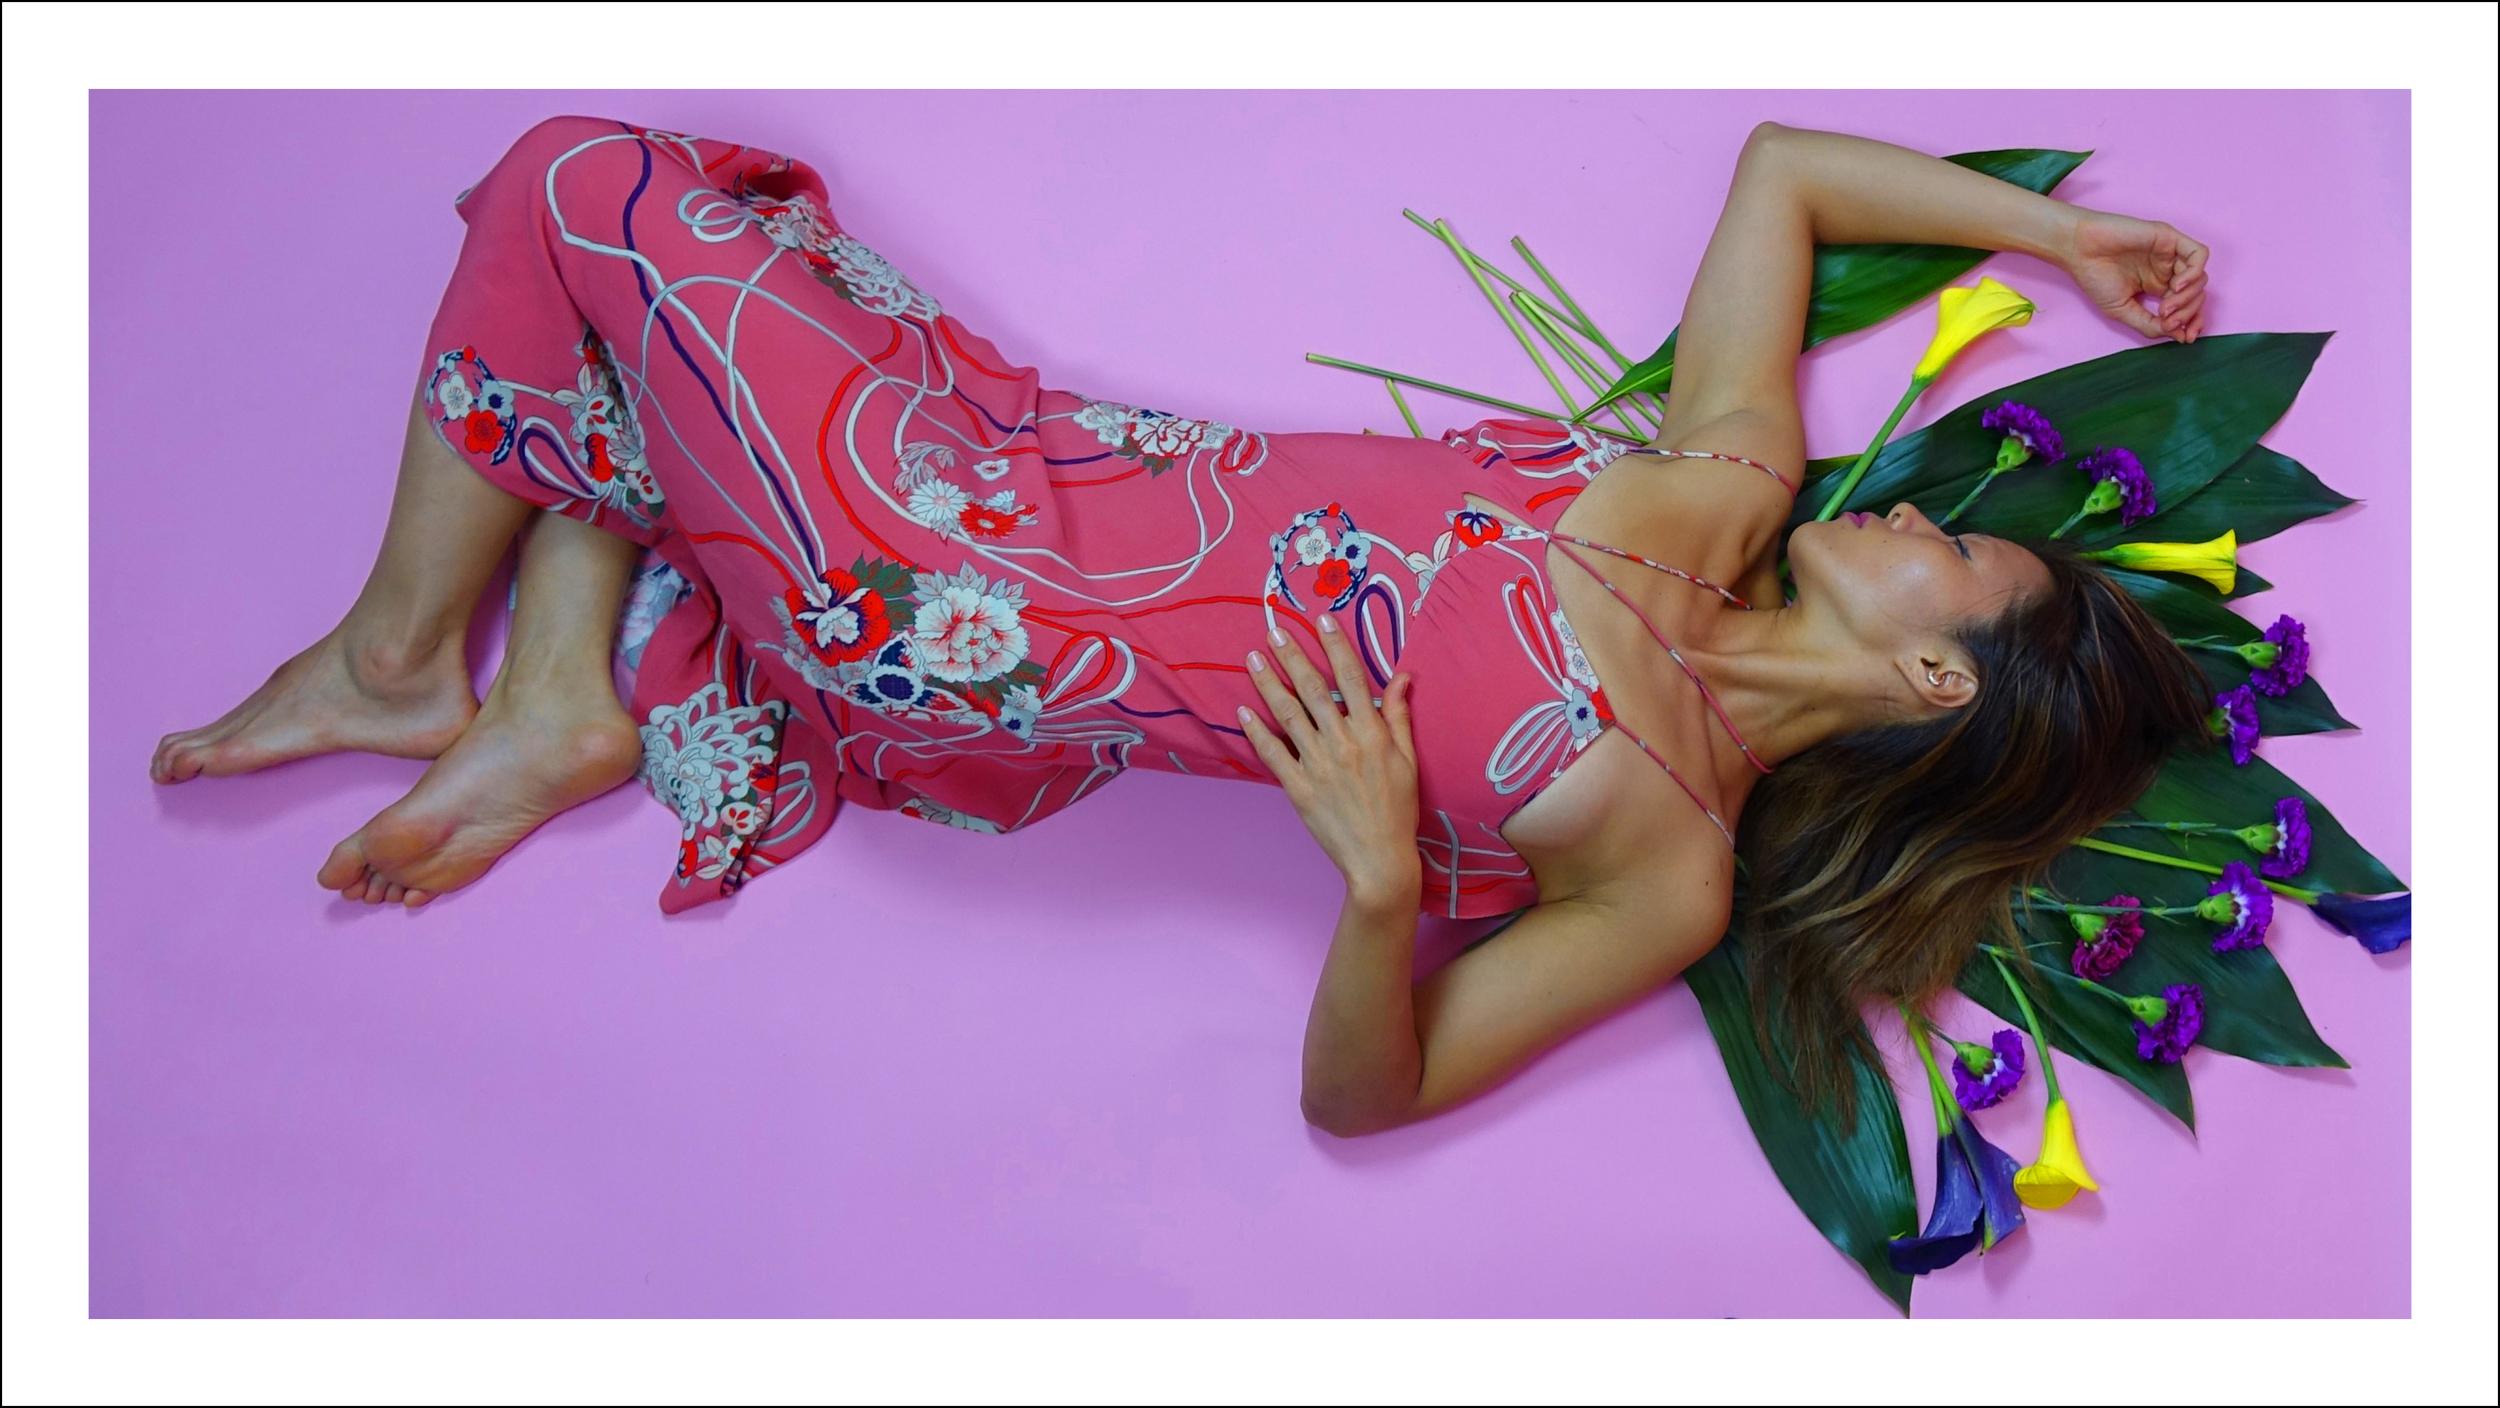 Photography, Art Direction, Post Production : Maxmillion Rosario Model:  Riji Suh   Styling & Design Direction:  Simon Alcantara  Produced by  Creative Collective Col-LAB